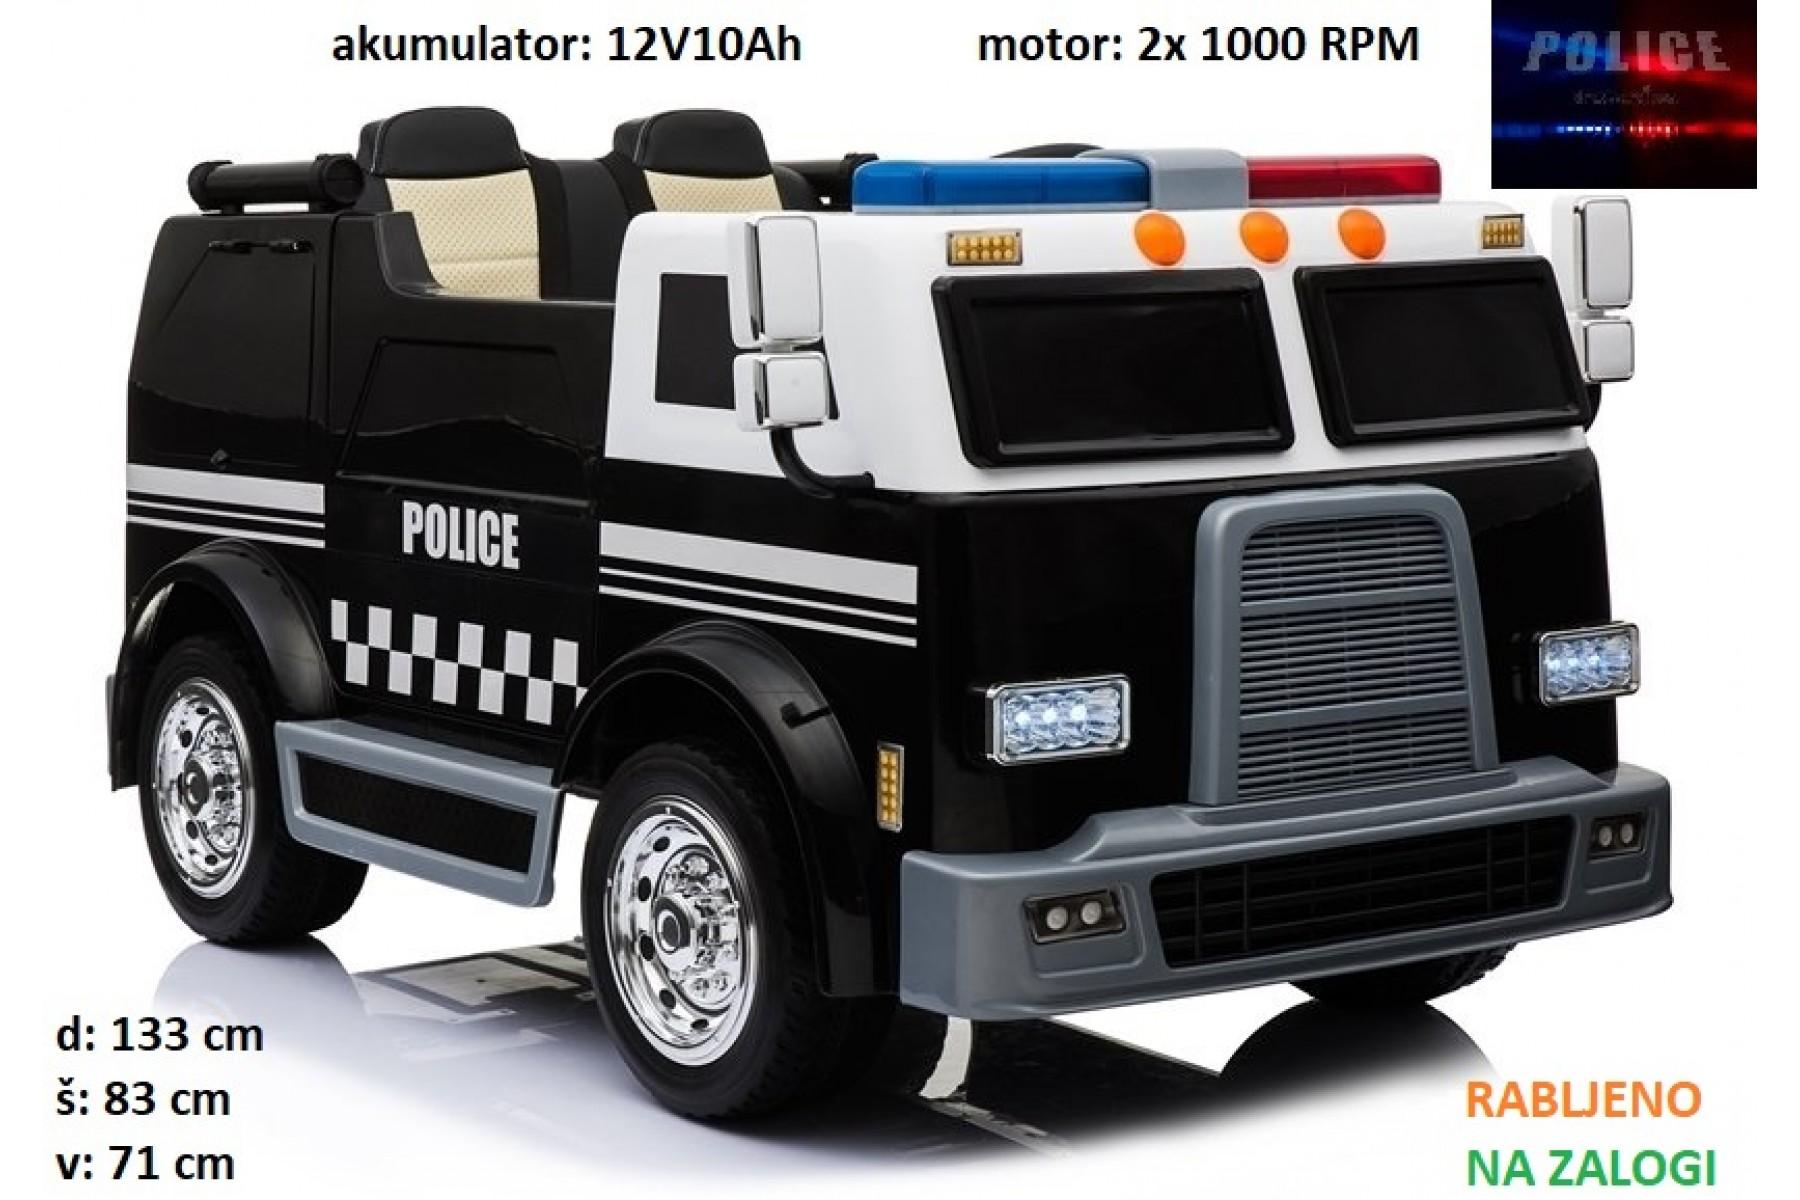 otroški POLICIJSKI tovornjak (dvosed, rabljen 4 ure)